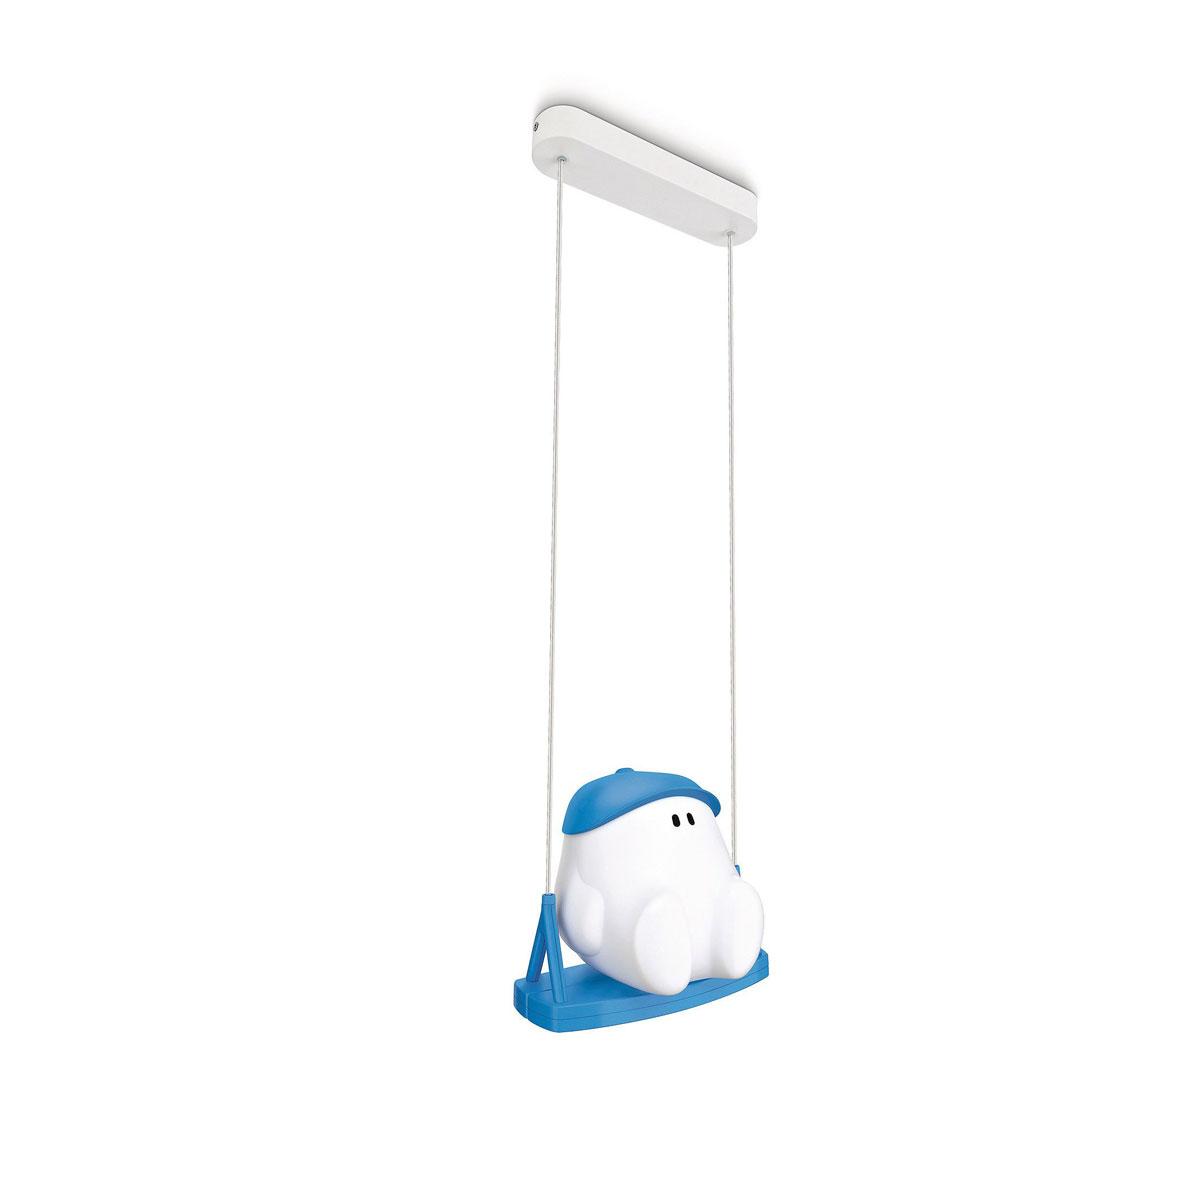 philips mykidsroom buddy swing hanglamp blauw. Black Bedroom Furniture Sets. Home Design Ideas